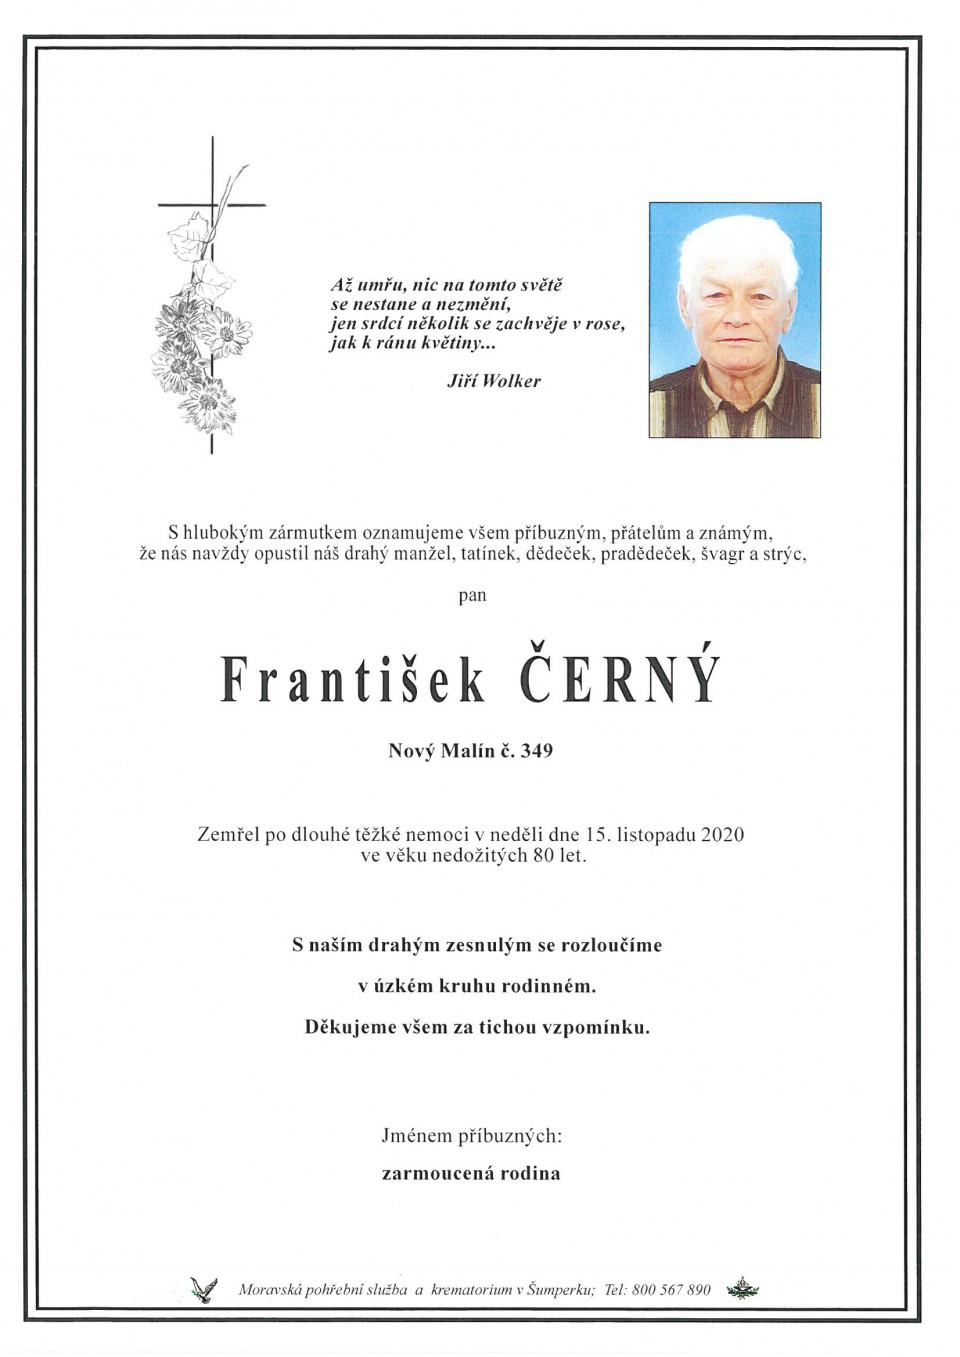 František Černý.jpg